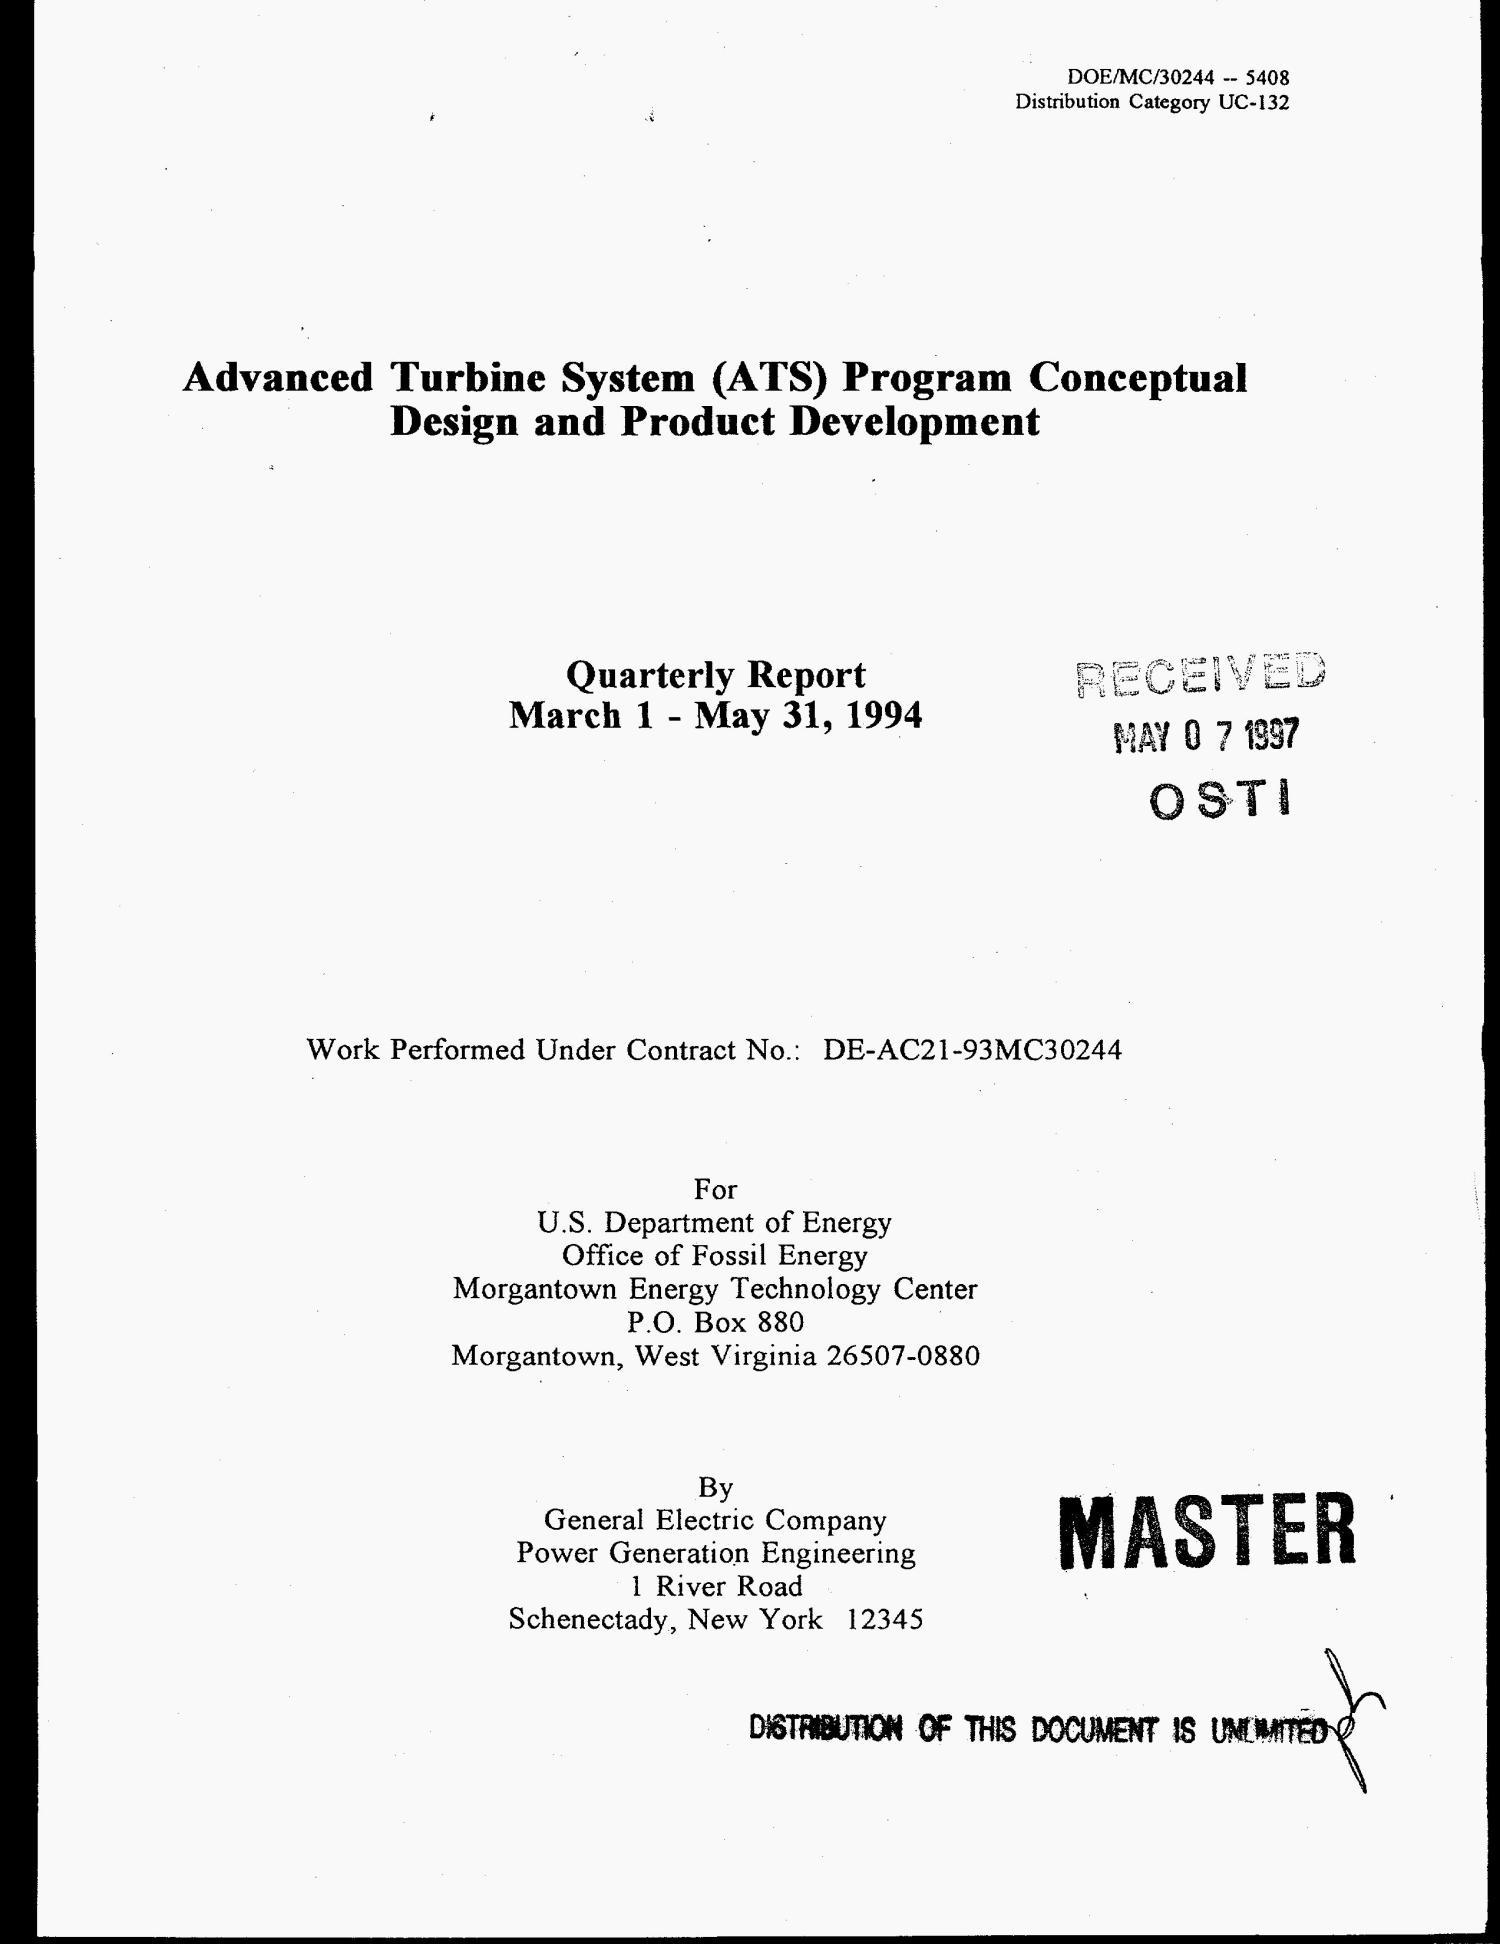 Advanced Turbine System ATS program conceptual design and